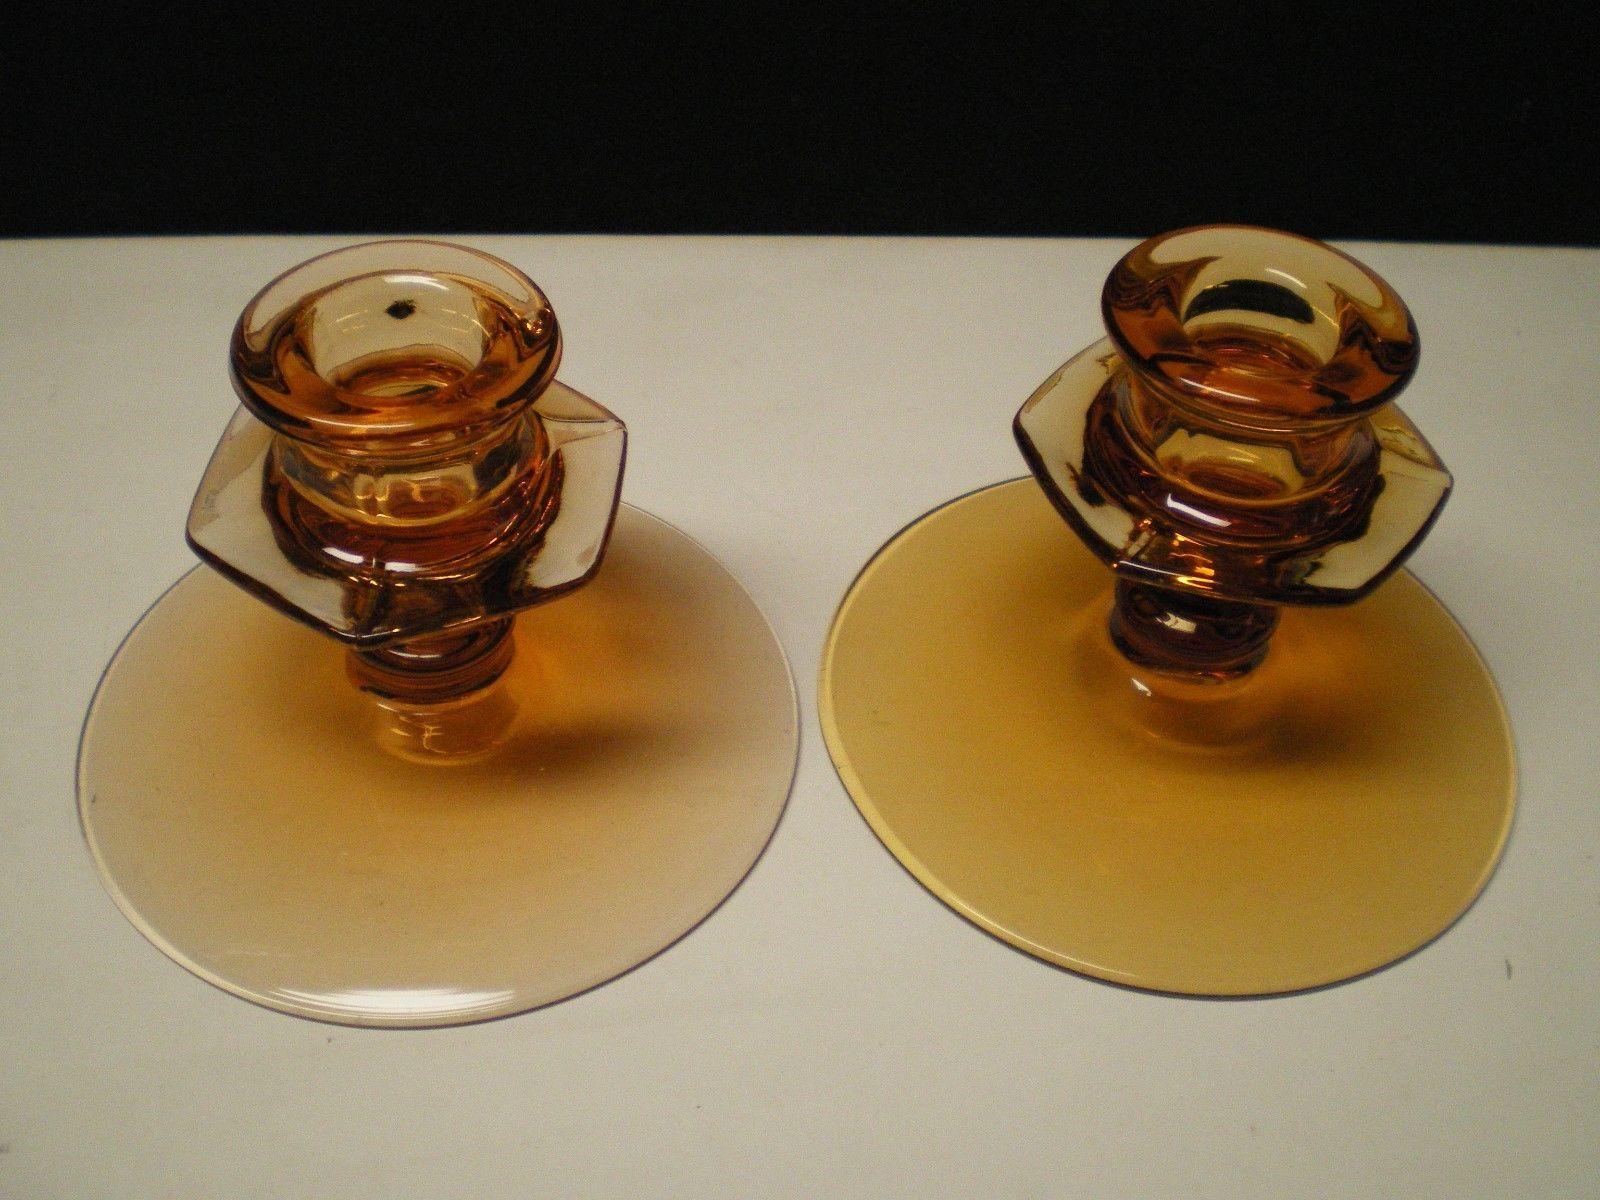 NICE PAIR OF FOSTORIA FAIRFAX AMBER SHORT CANDLES - $9.95